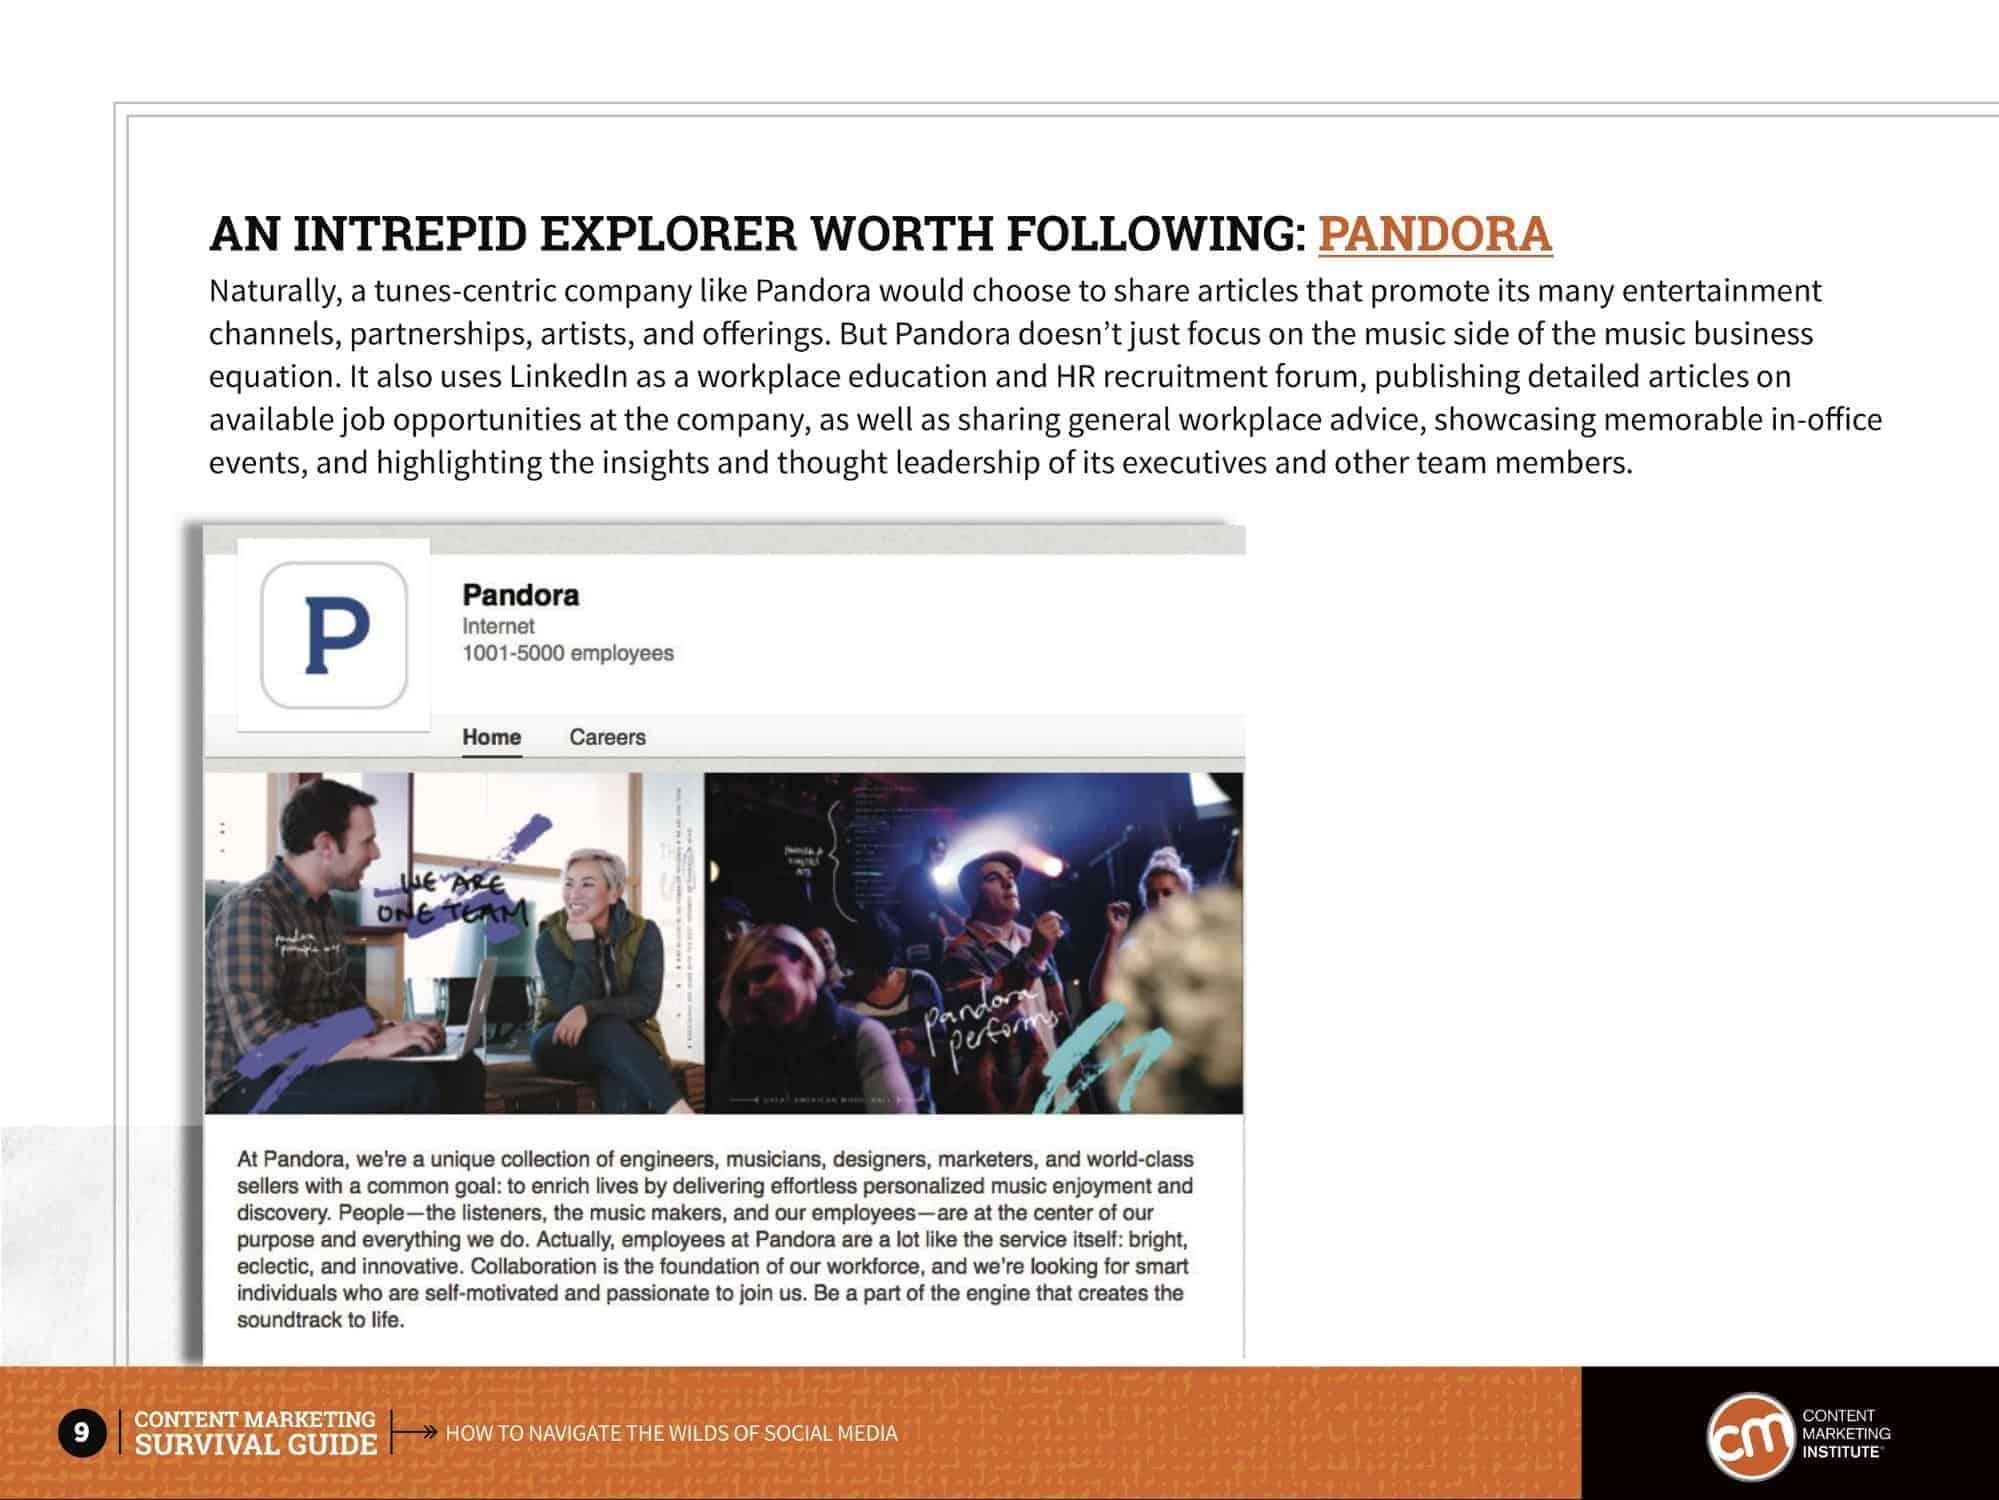 pandora linkedin case study, content marketing example